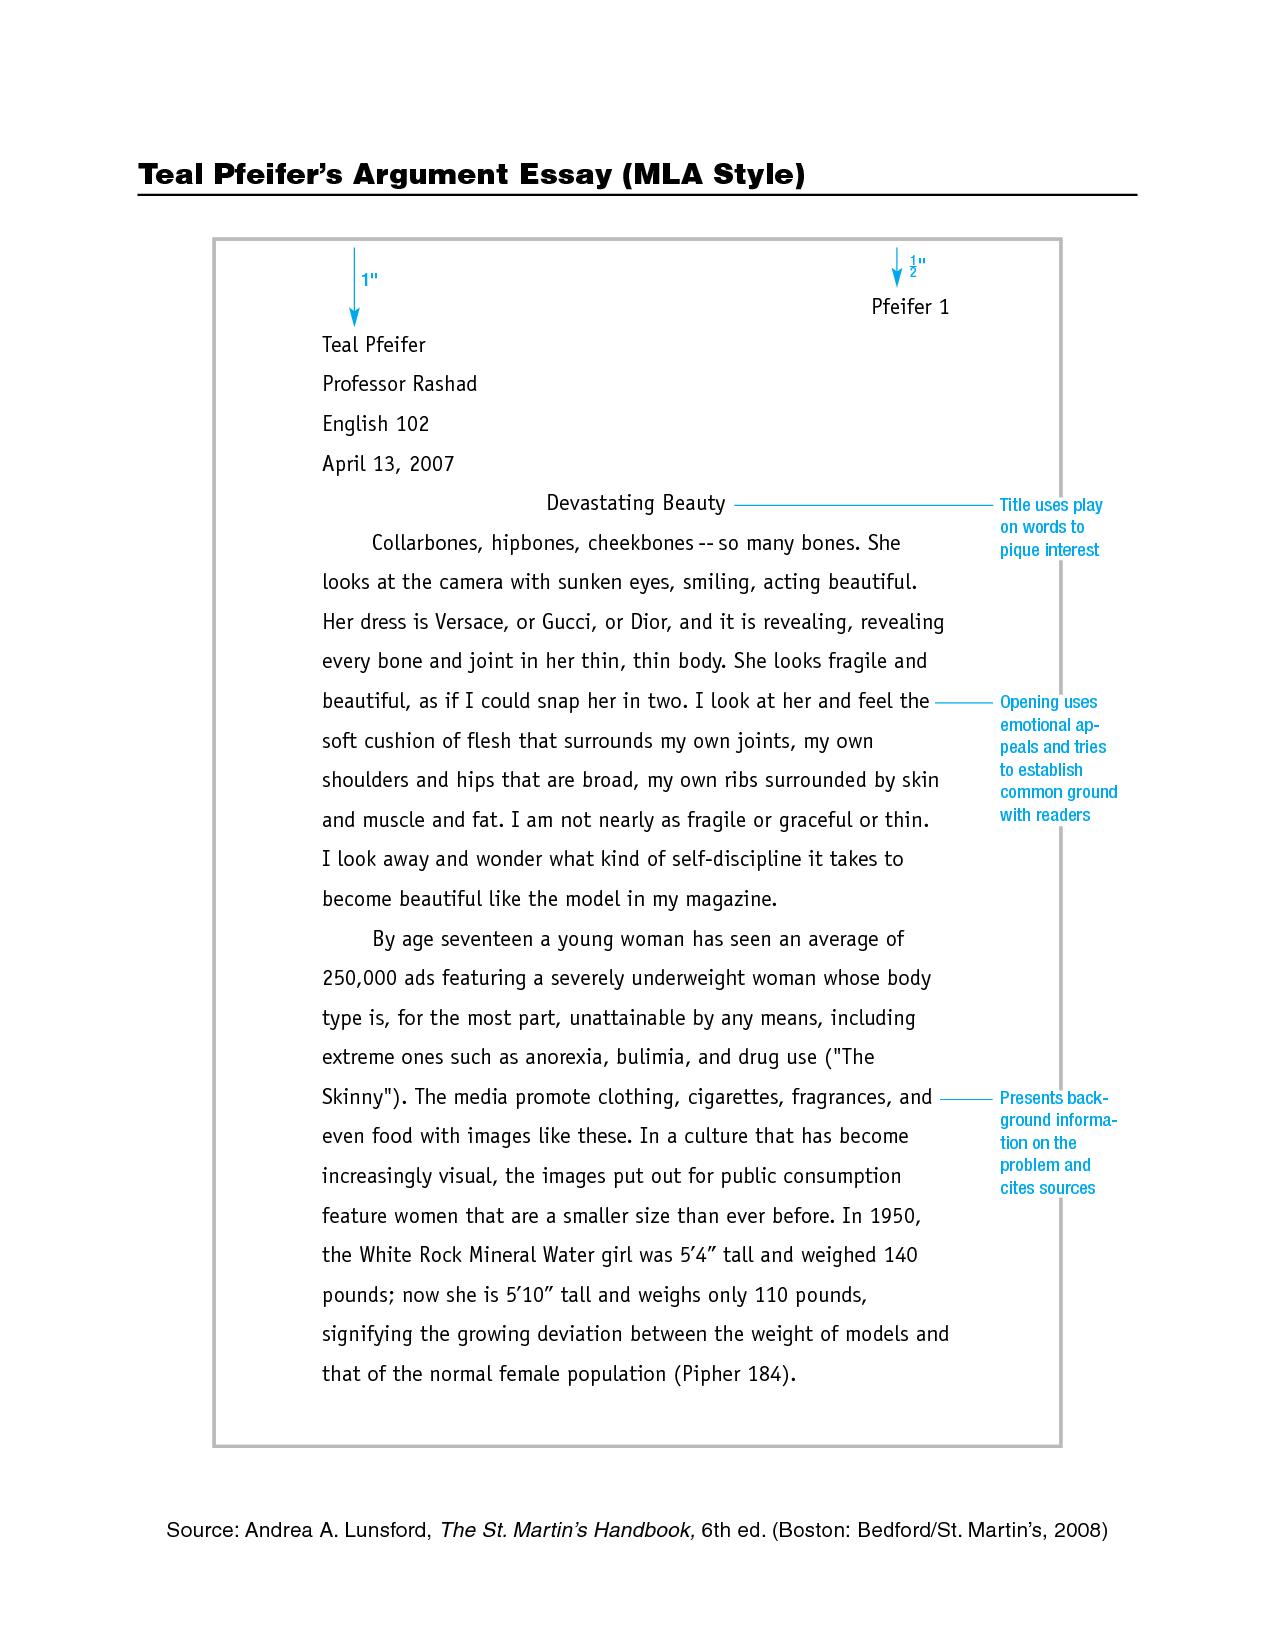 massachusetts financial statement long form instructions